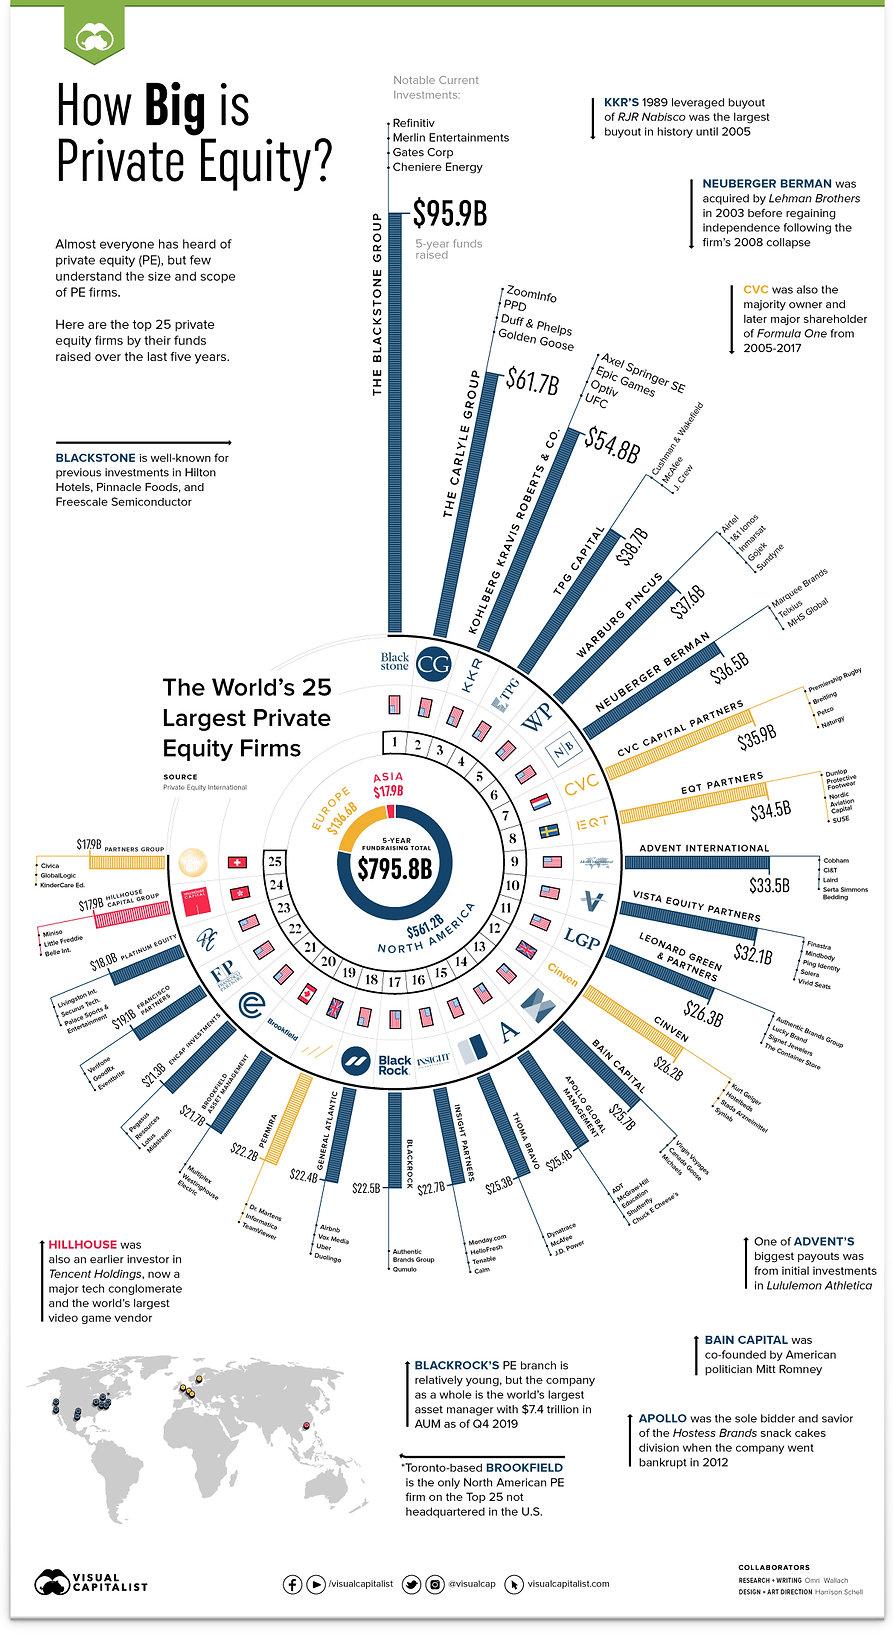 PrivateEquityTop25-Infographic-8.jpg